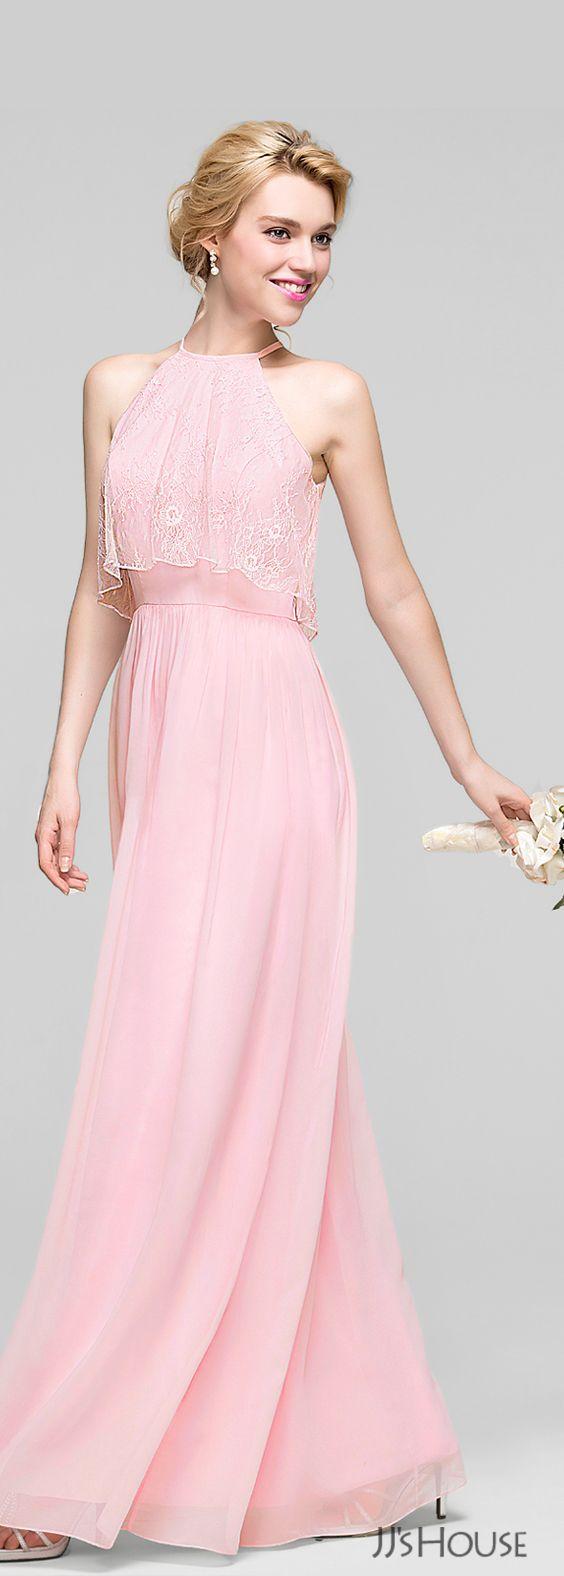 JJsHouse #Bridesmaid | Bridesmaid gowns | Pinterest | Vestiditos ...